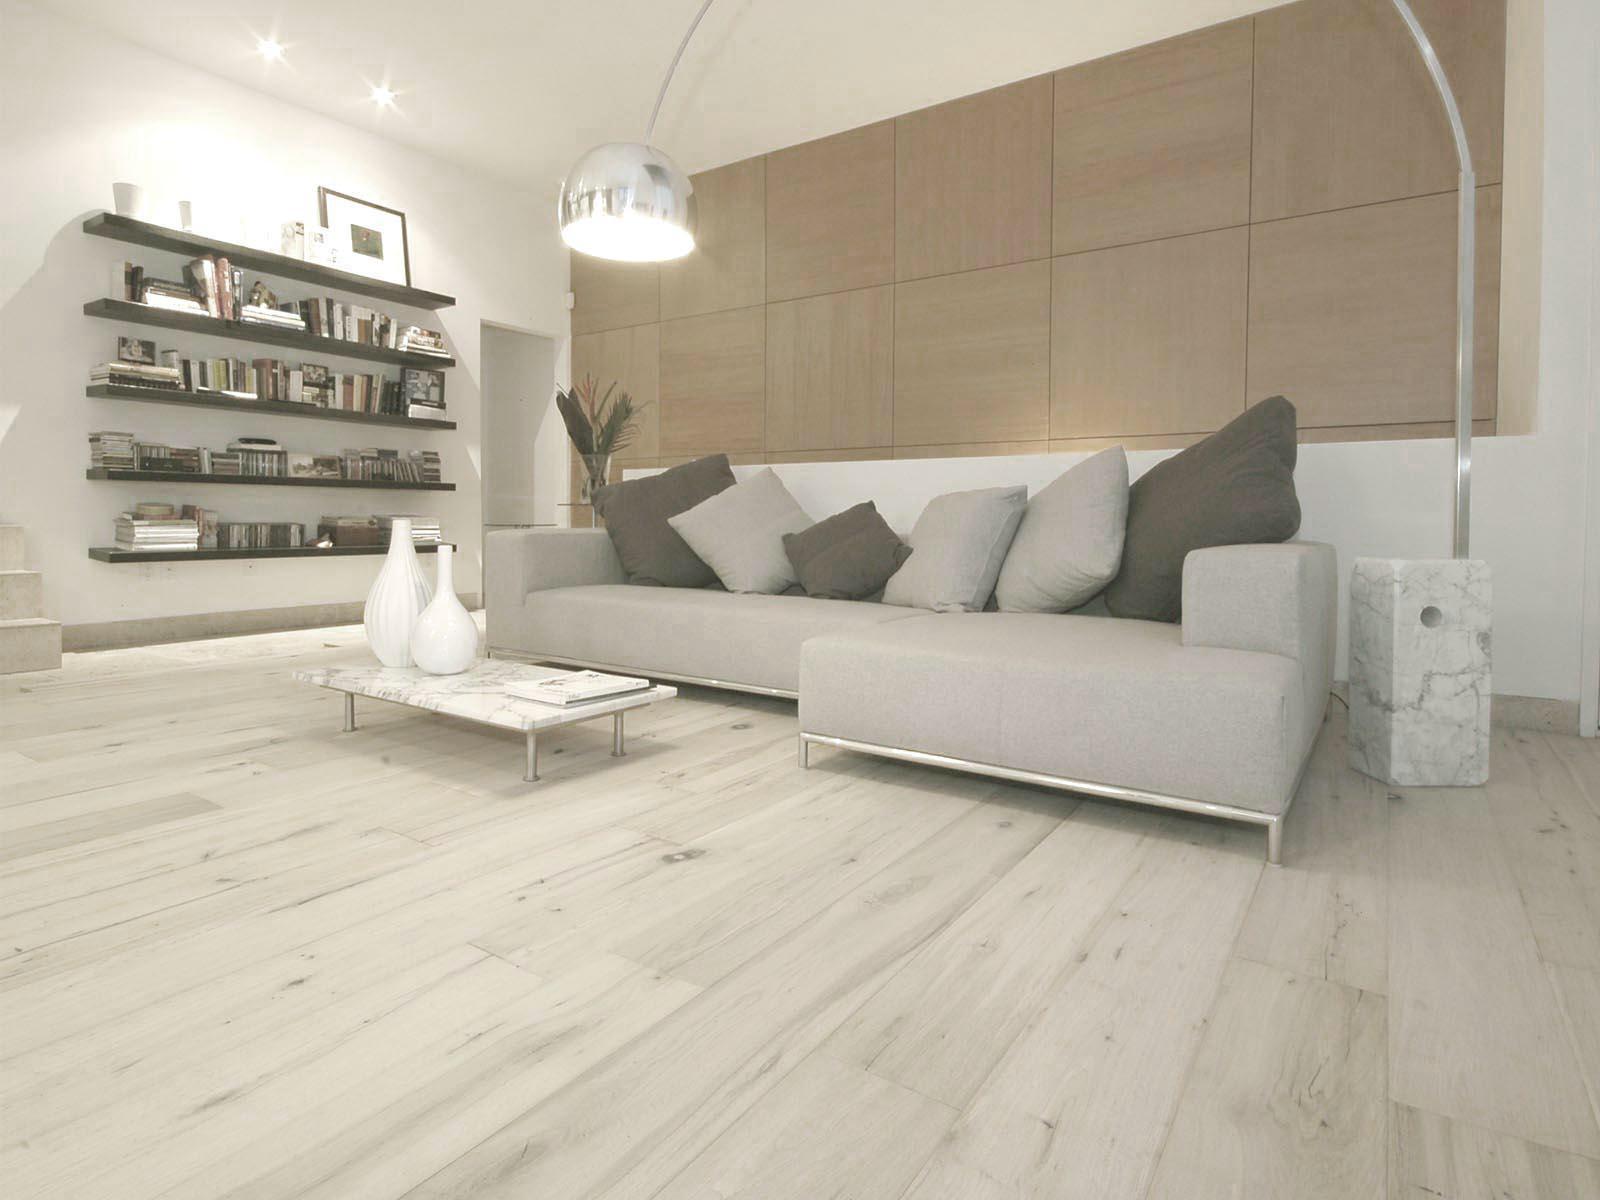 hardwood floors floating vs glue down of mohawk fresh cream 9 wide glue down luxury vinyl plank flooring intended for mohawk fresh cream 9 wide glue down luxury vinyl plank flooring room